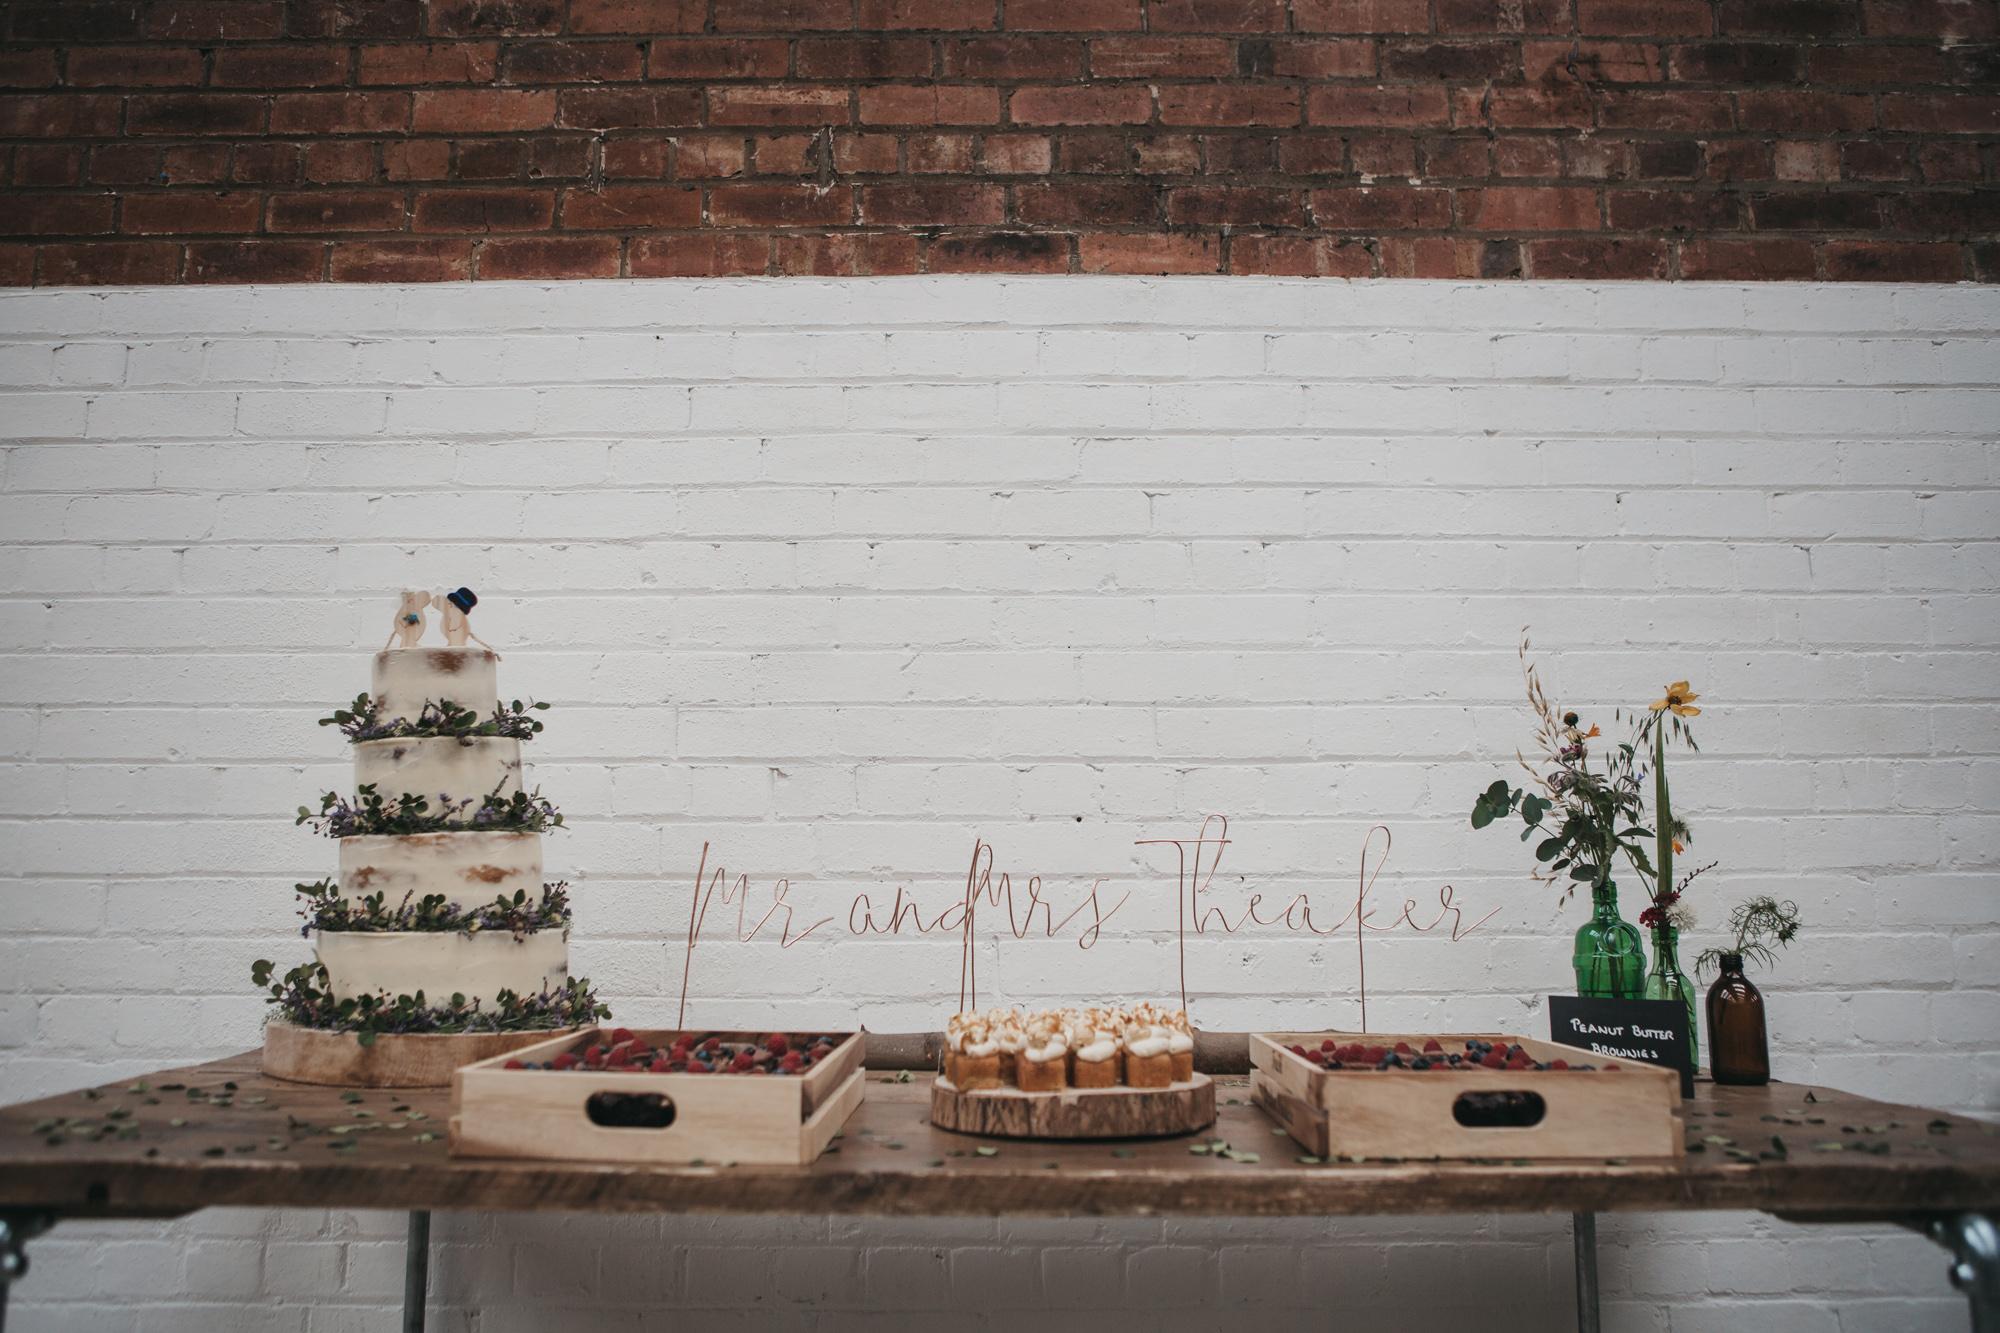 Kristy-Back-Garden-Outdoor-Wedding-Sheffield-Industrial-Warehouse-Wedding-Bohemian-Kate-Beaumont-Dahlia-Dress-39.jpg